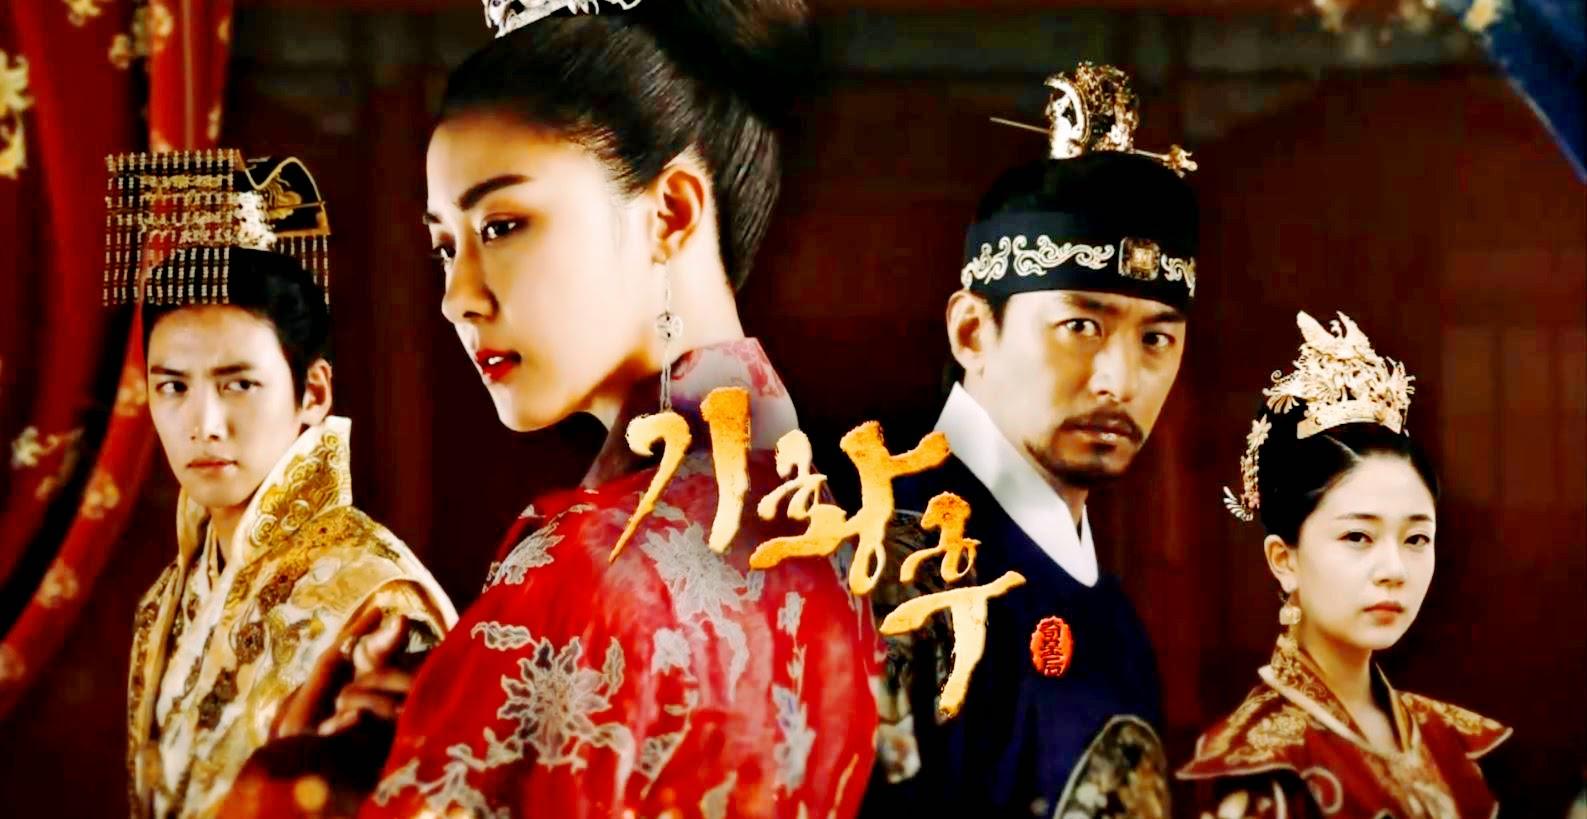 Our Addiction to Empress Ki has Finally Ended   Above Precious rubies 1587x819